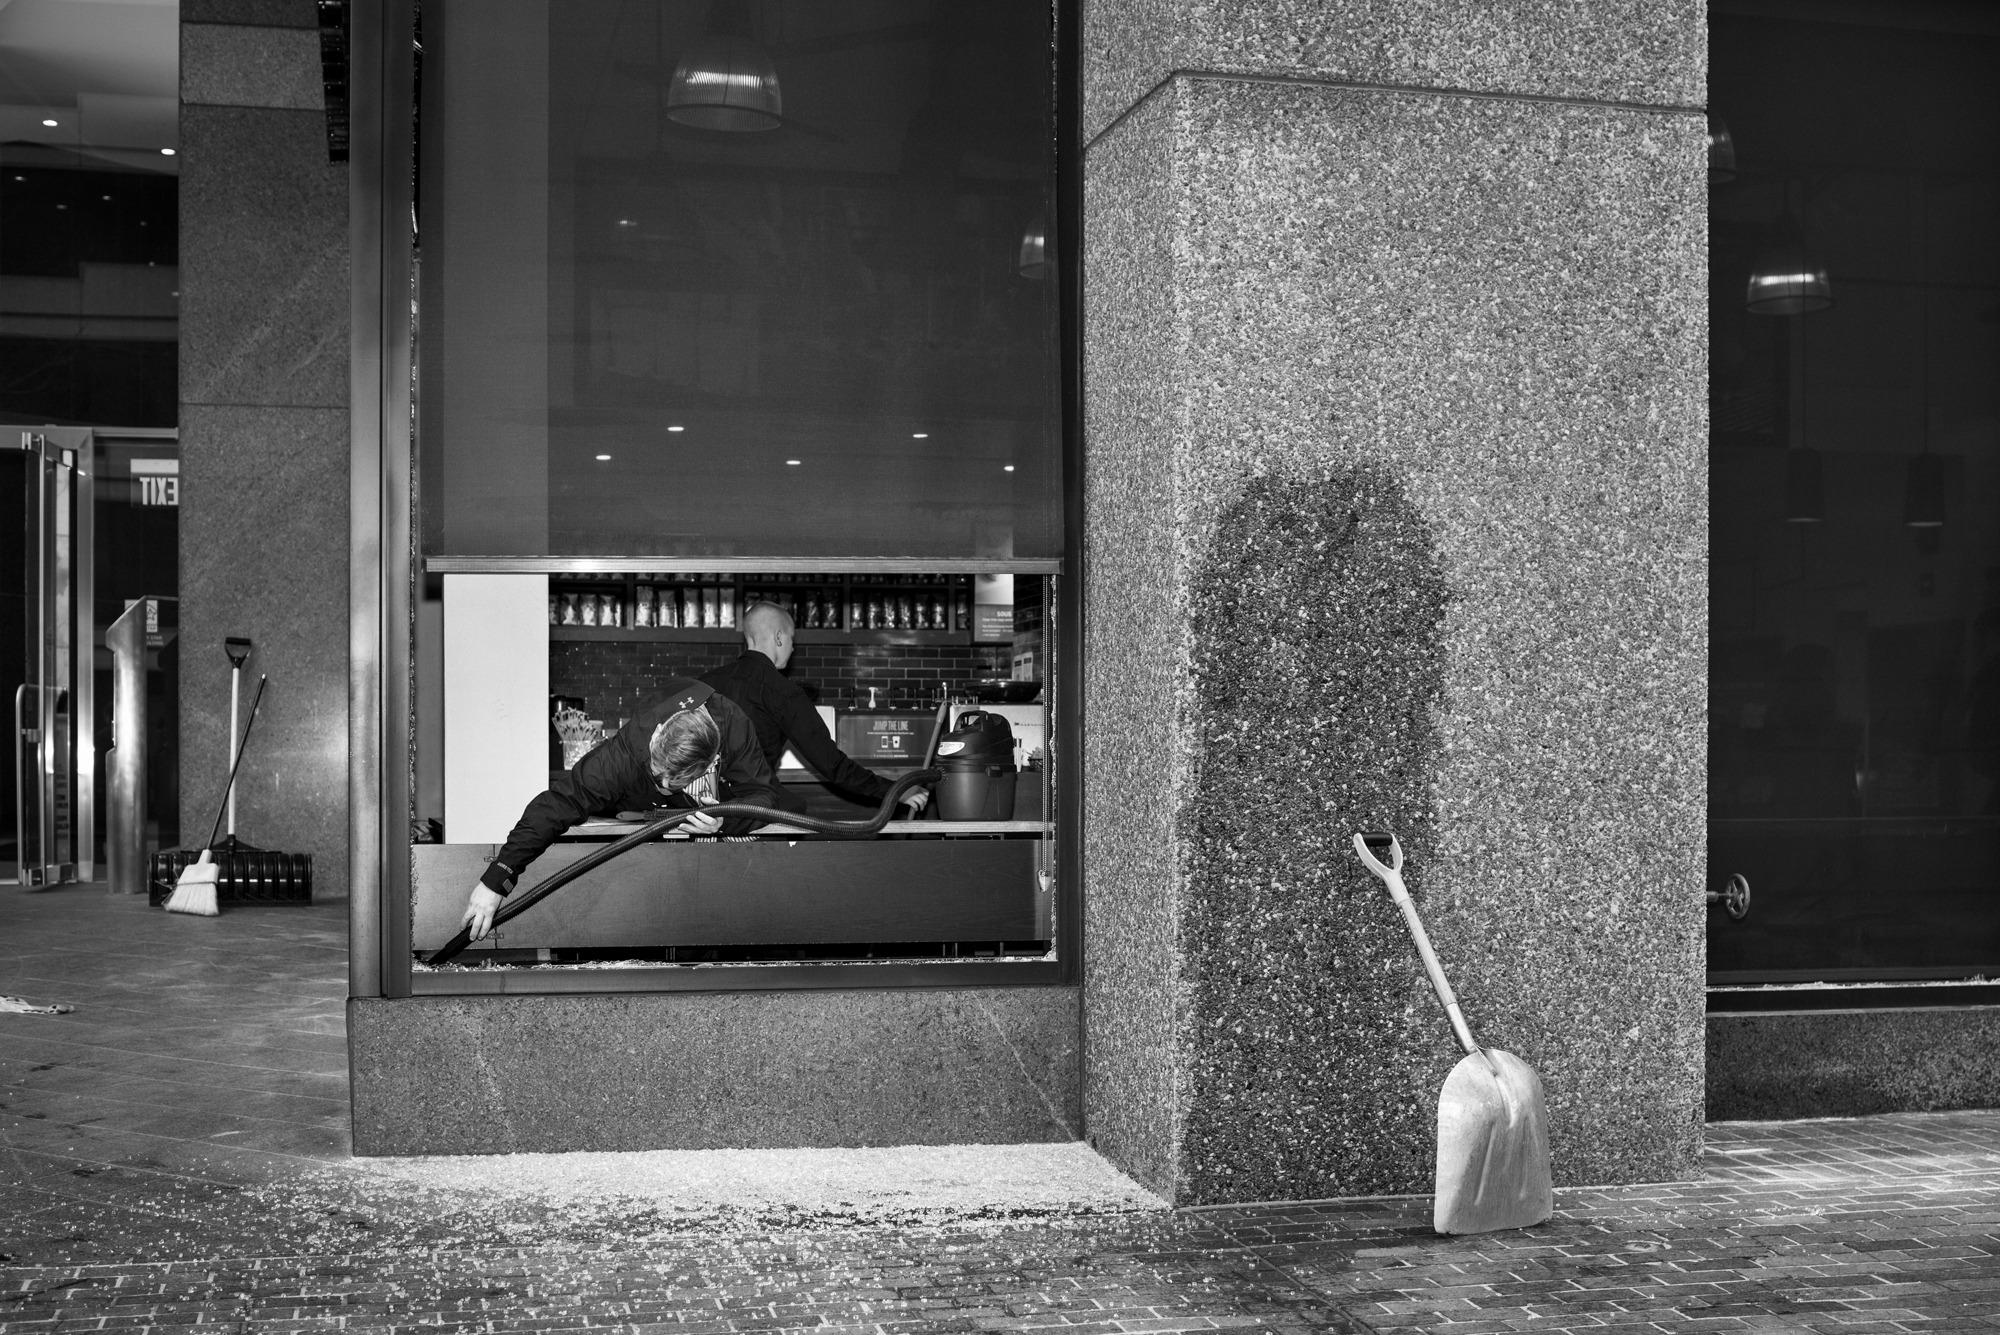 Mike Osborne Starbucks / I St NW,